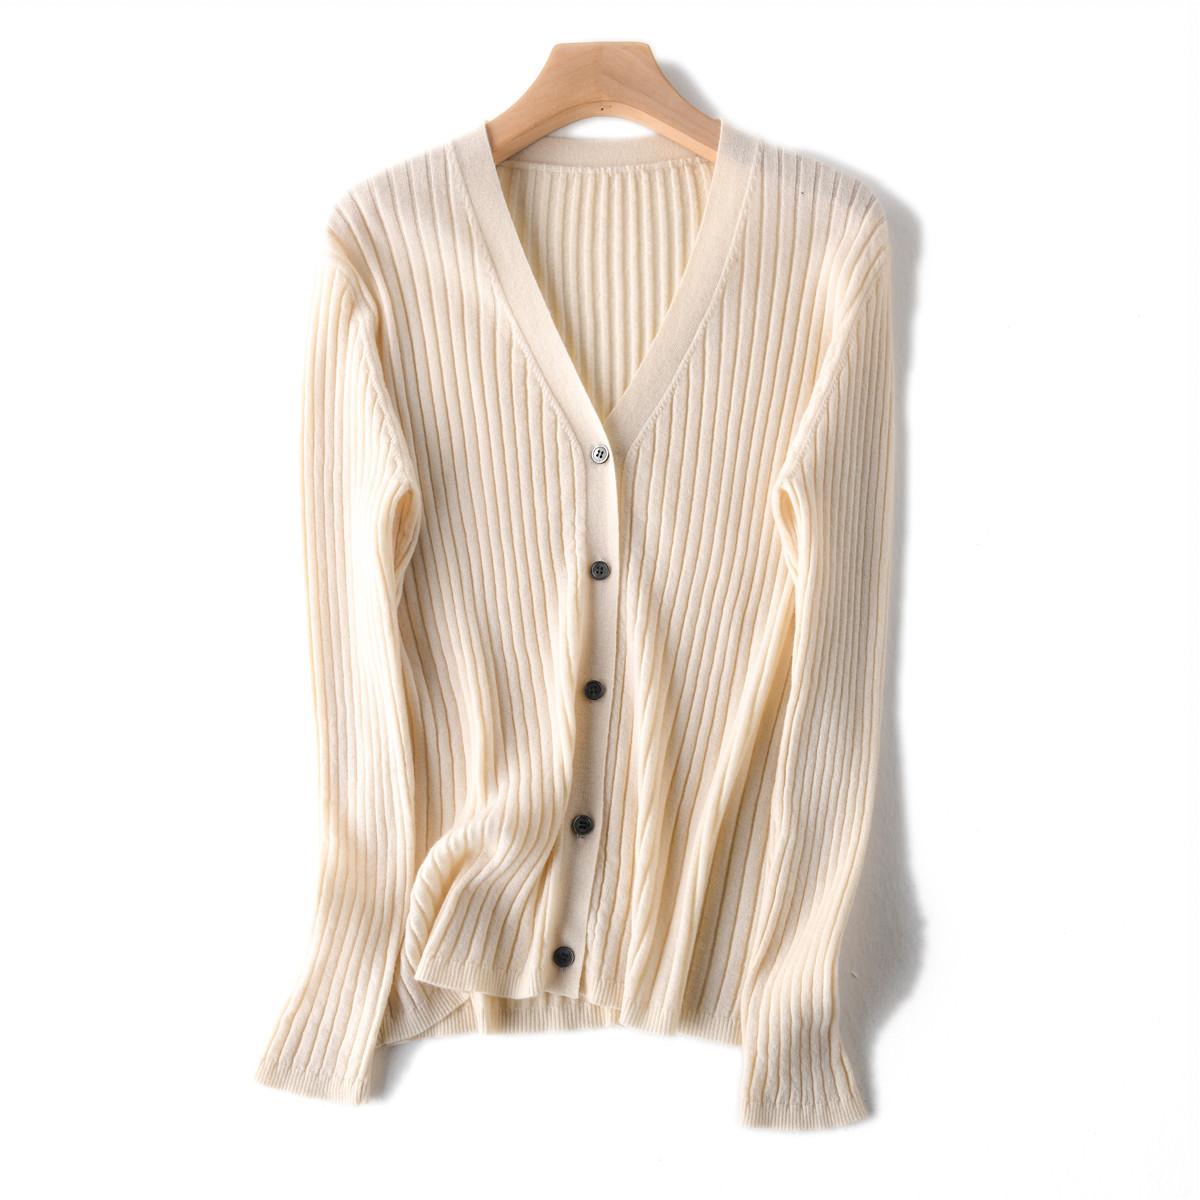 BI入精品 80支JI细羊毛 显瘦坑条修身V领针织开衫女2019春夏薄款